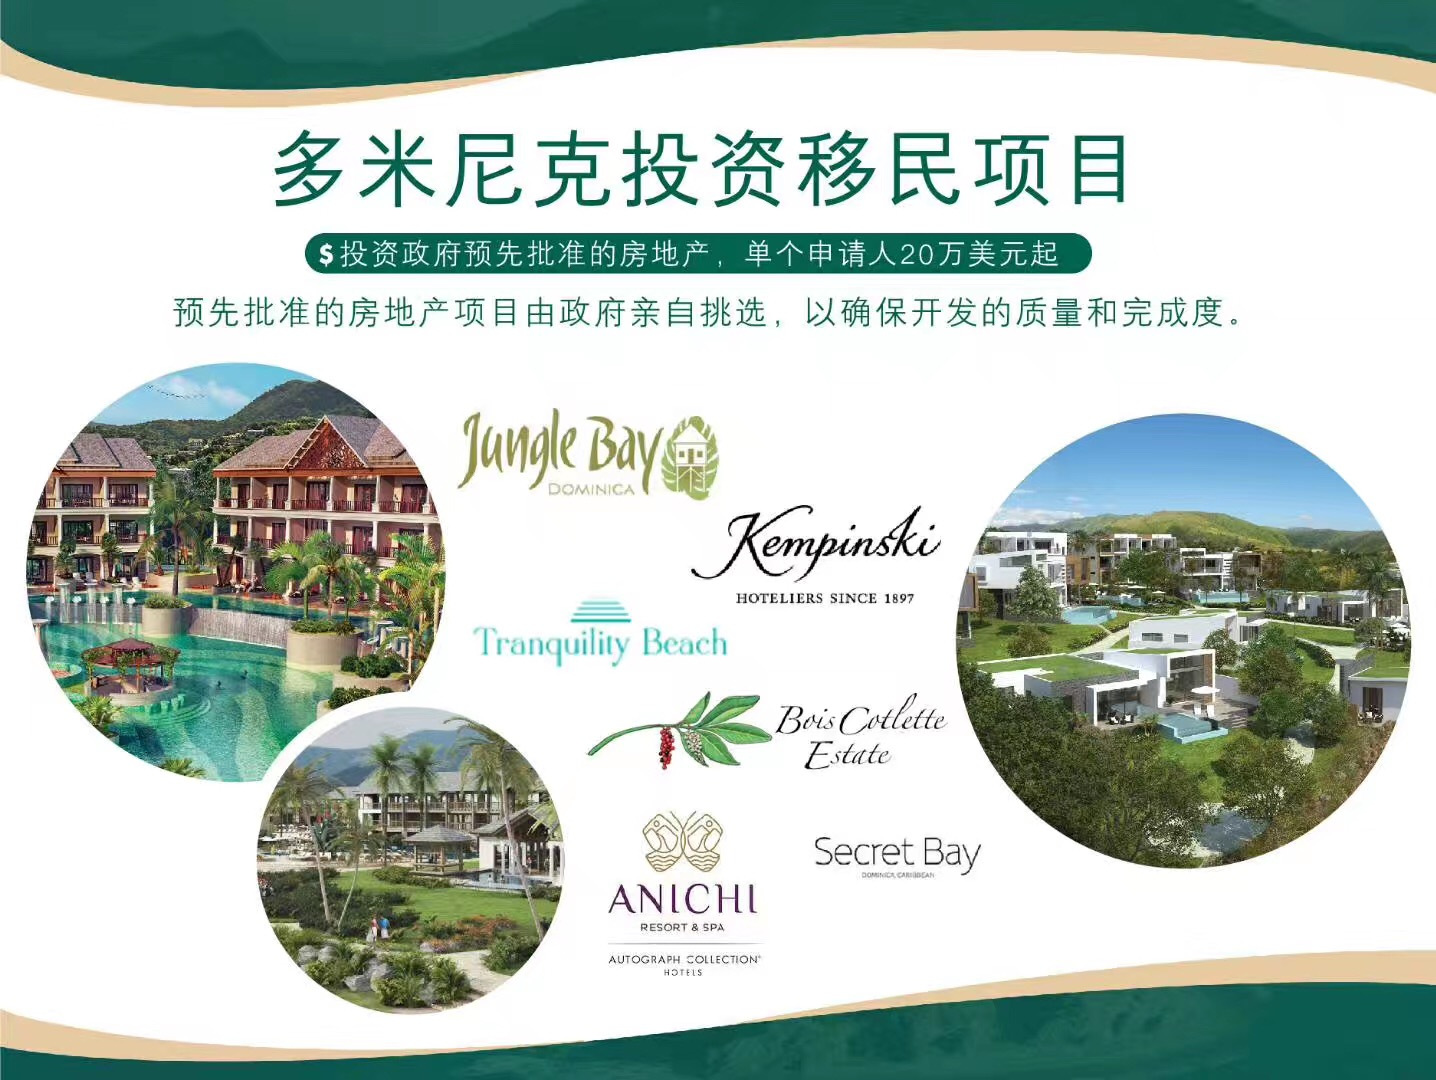 CS Global Partners睿智移民:多米尼克繁荣的酒店业为地产投资者提供良机